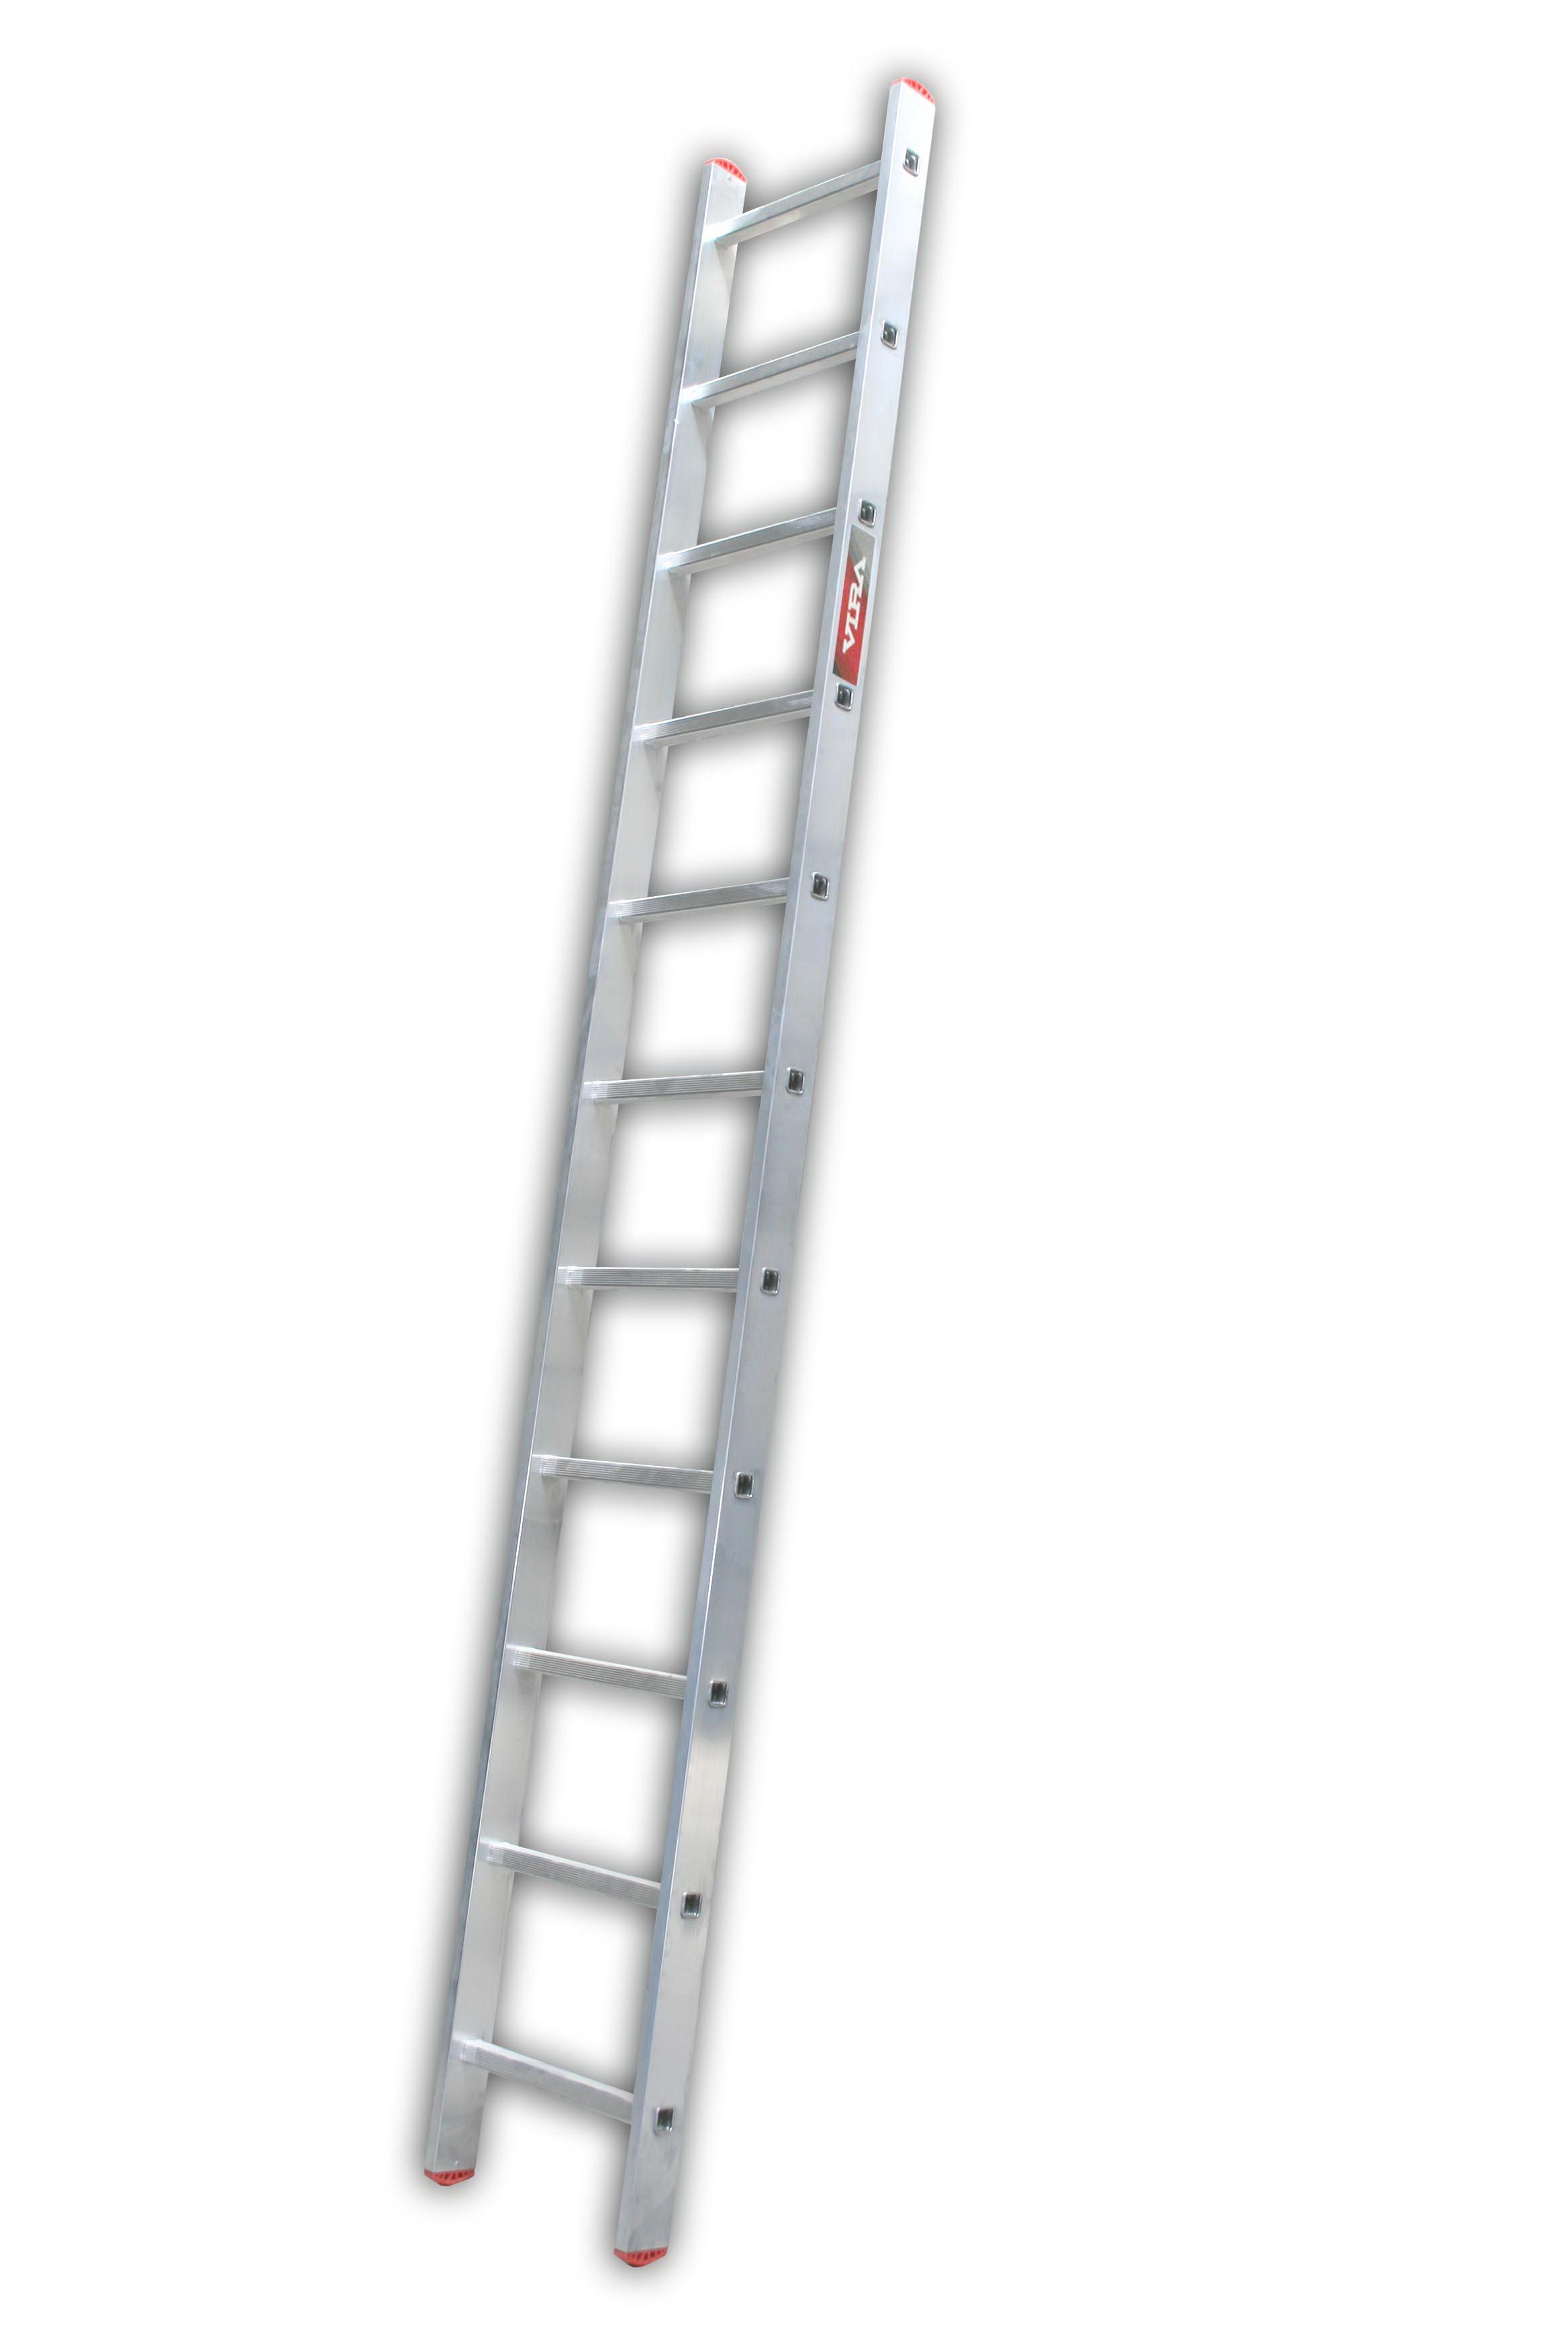 Лестница алюминиевая приставная Vira Rus 1х11 набор кран букс с рукоятками мария пластик 18х1 rus 1 2